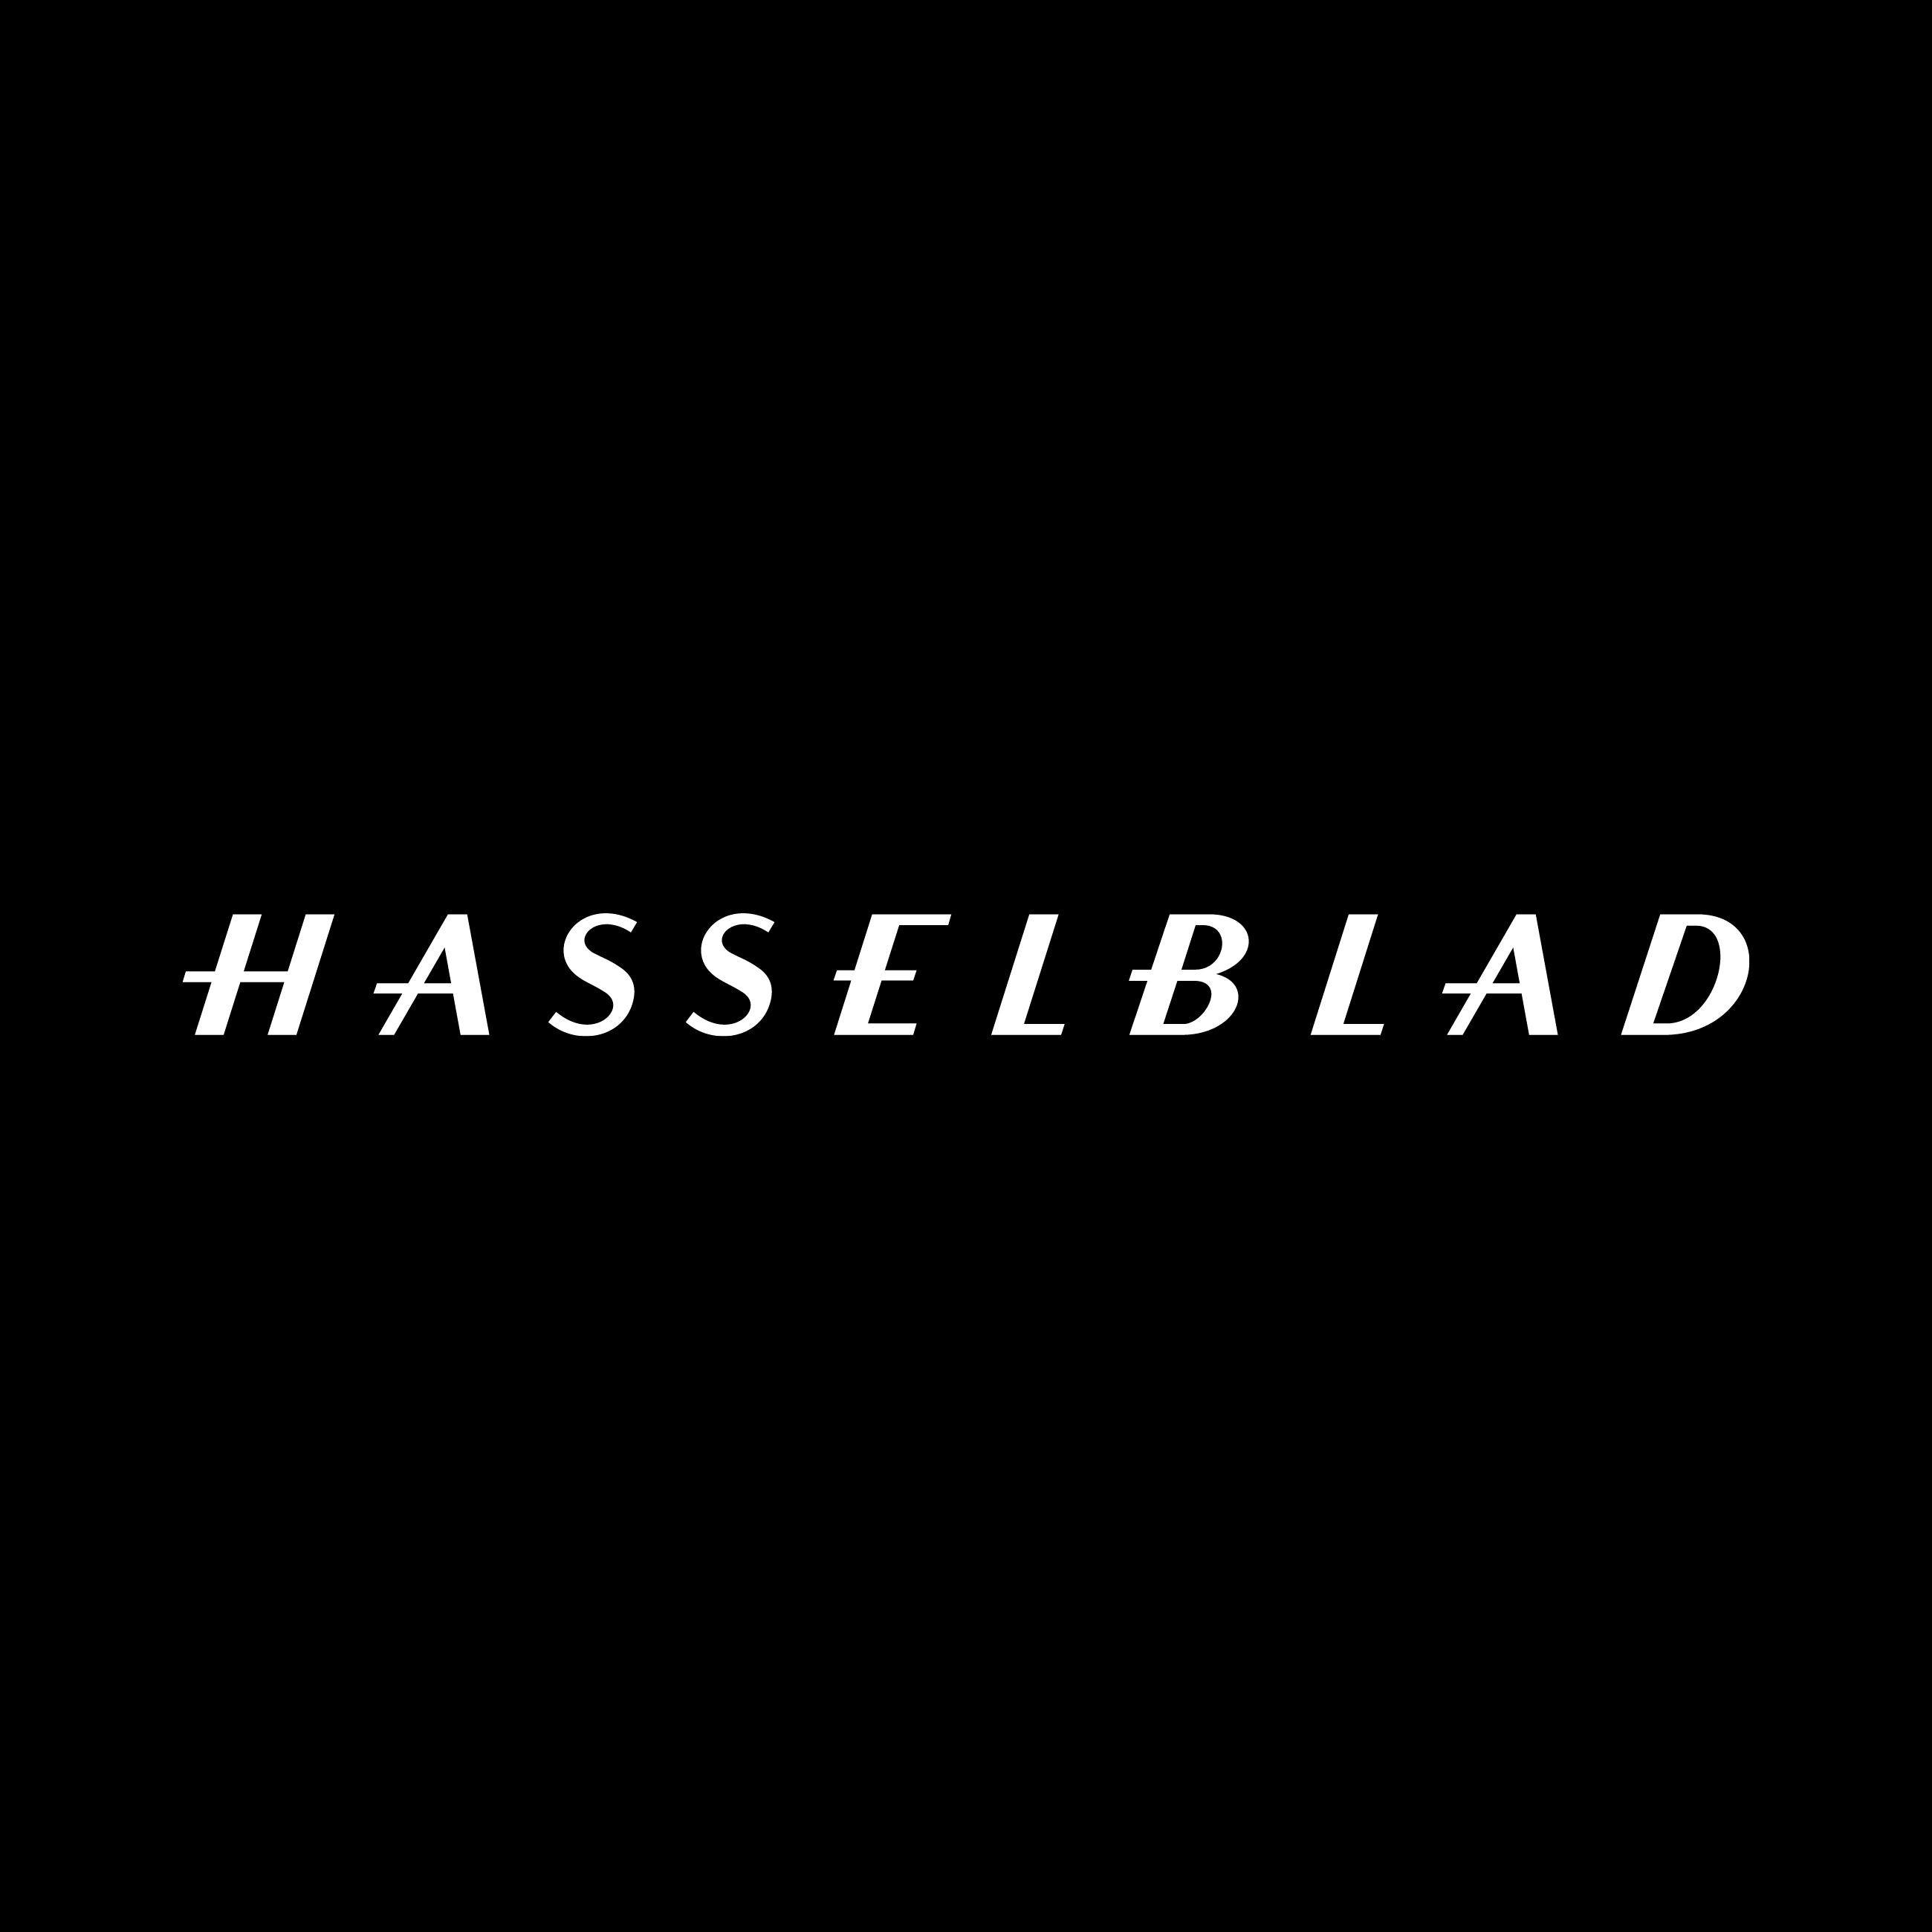 Hasselblad-logo_black